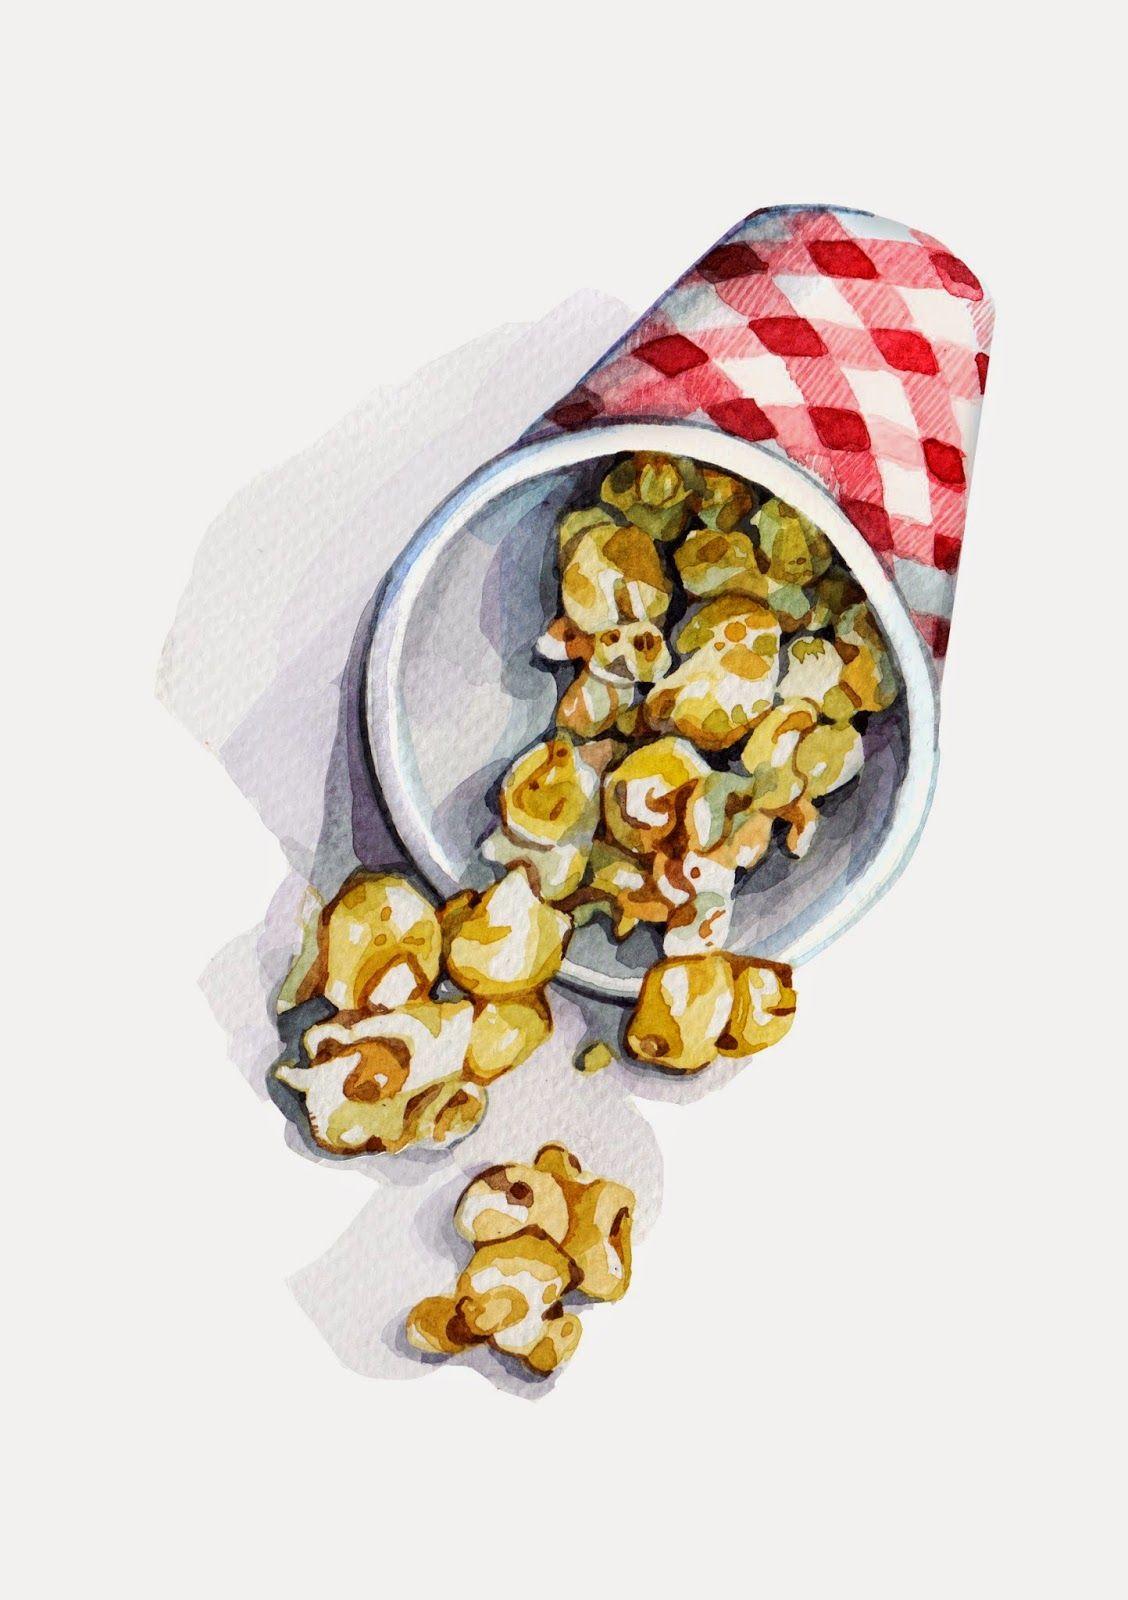 tiny snack small still life desert Original acrylic 6x8/' popcorn painting food realism kitchen miniature pop corn realistic artwork